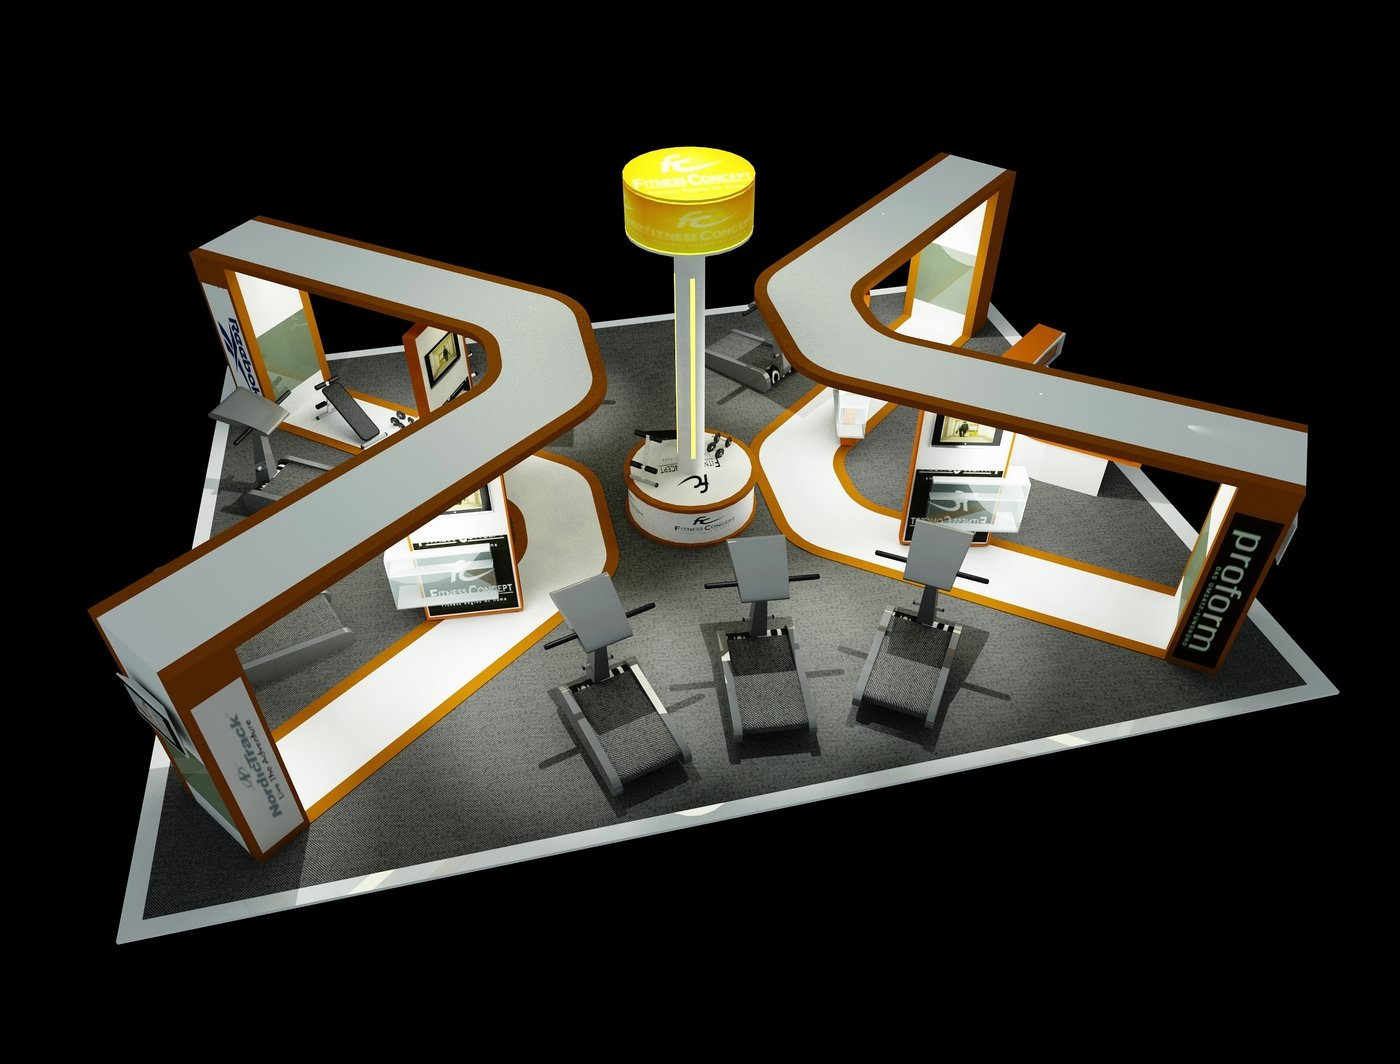 Exhibition Booth Design : Exhibition booth design by lawrence parir at coroflot